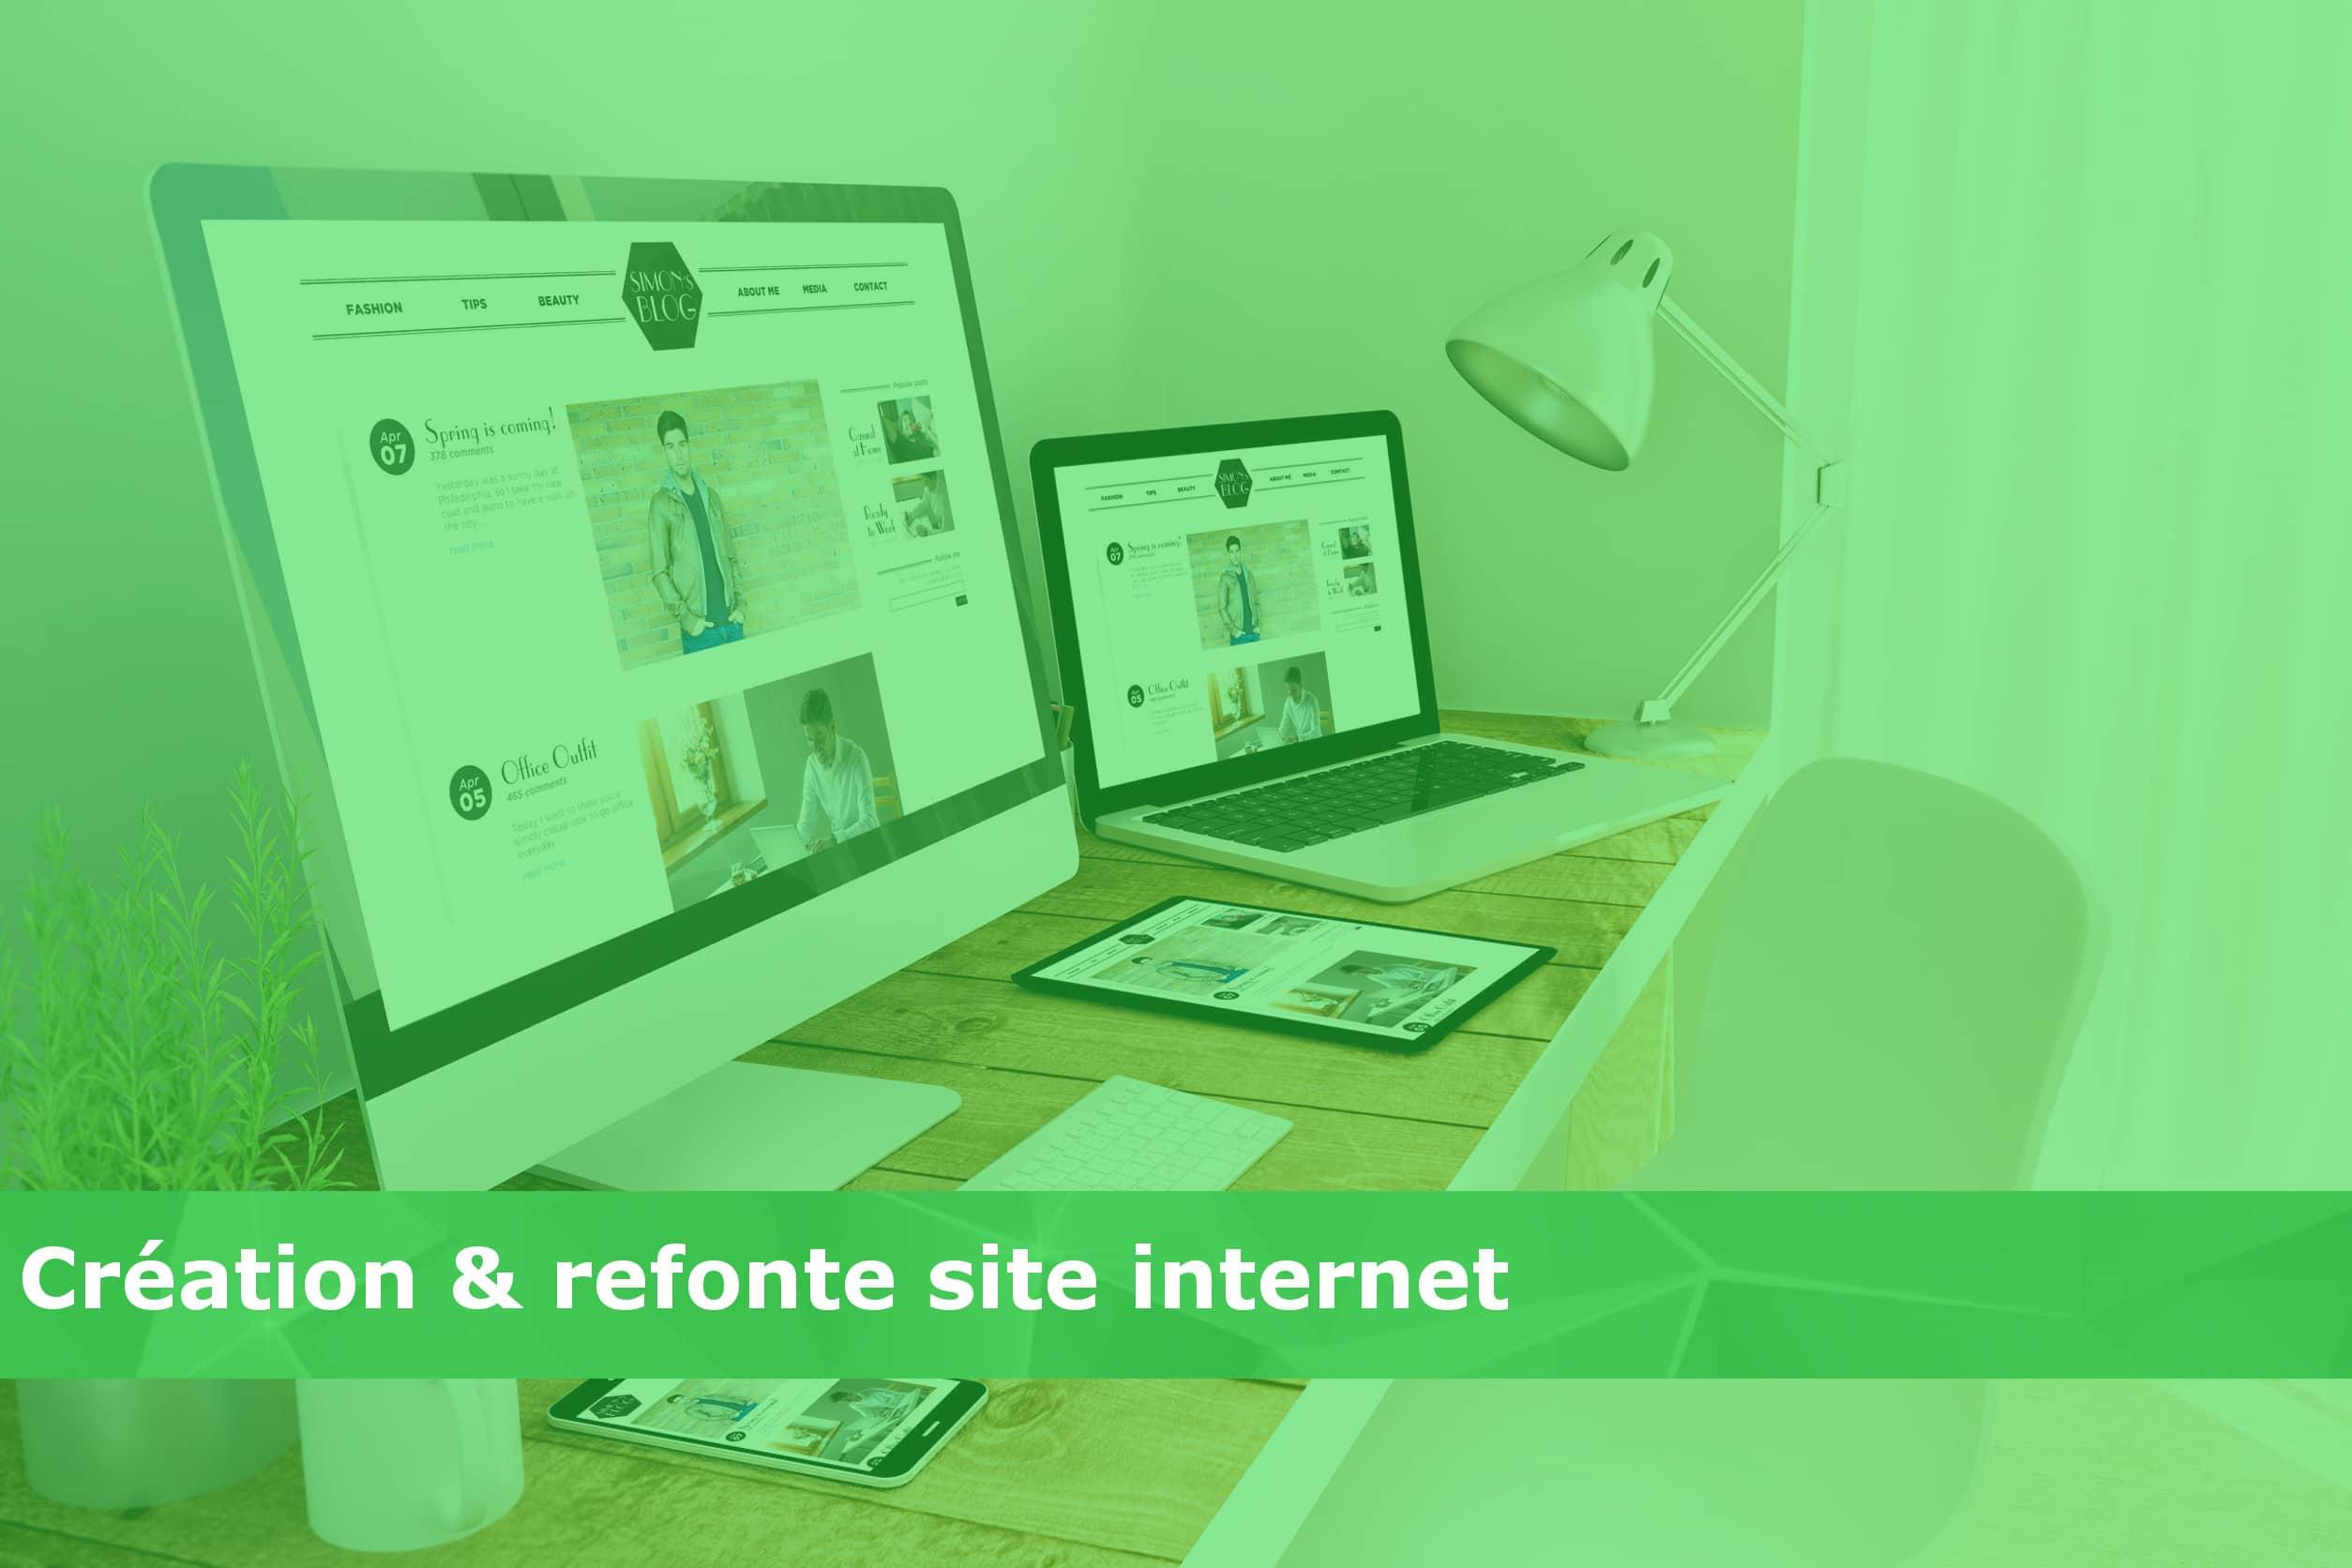 creation-refonte-site-internet-cta-green